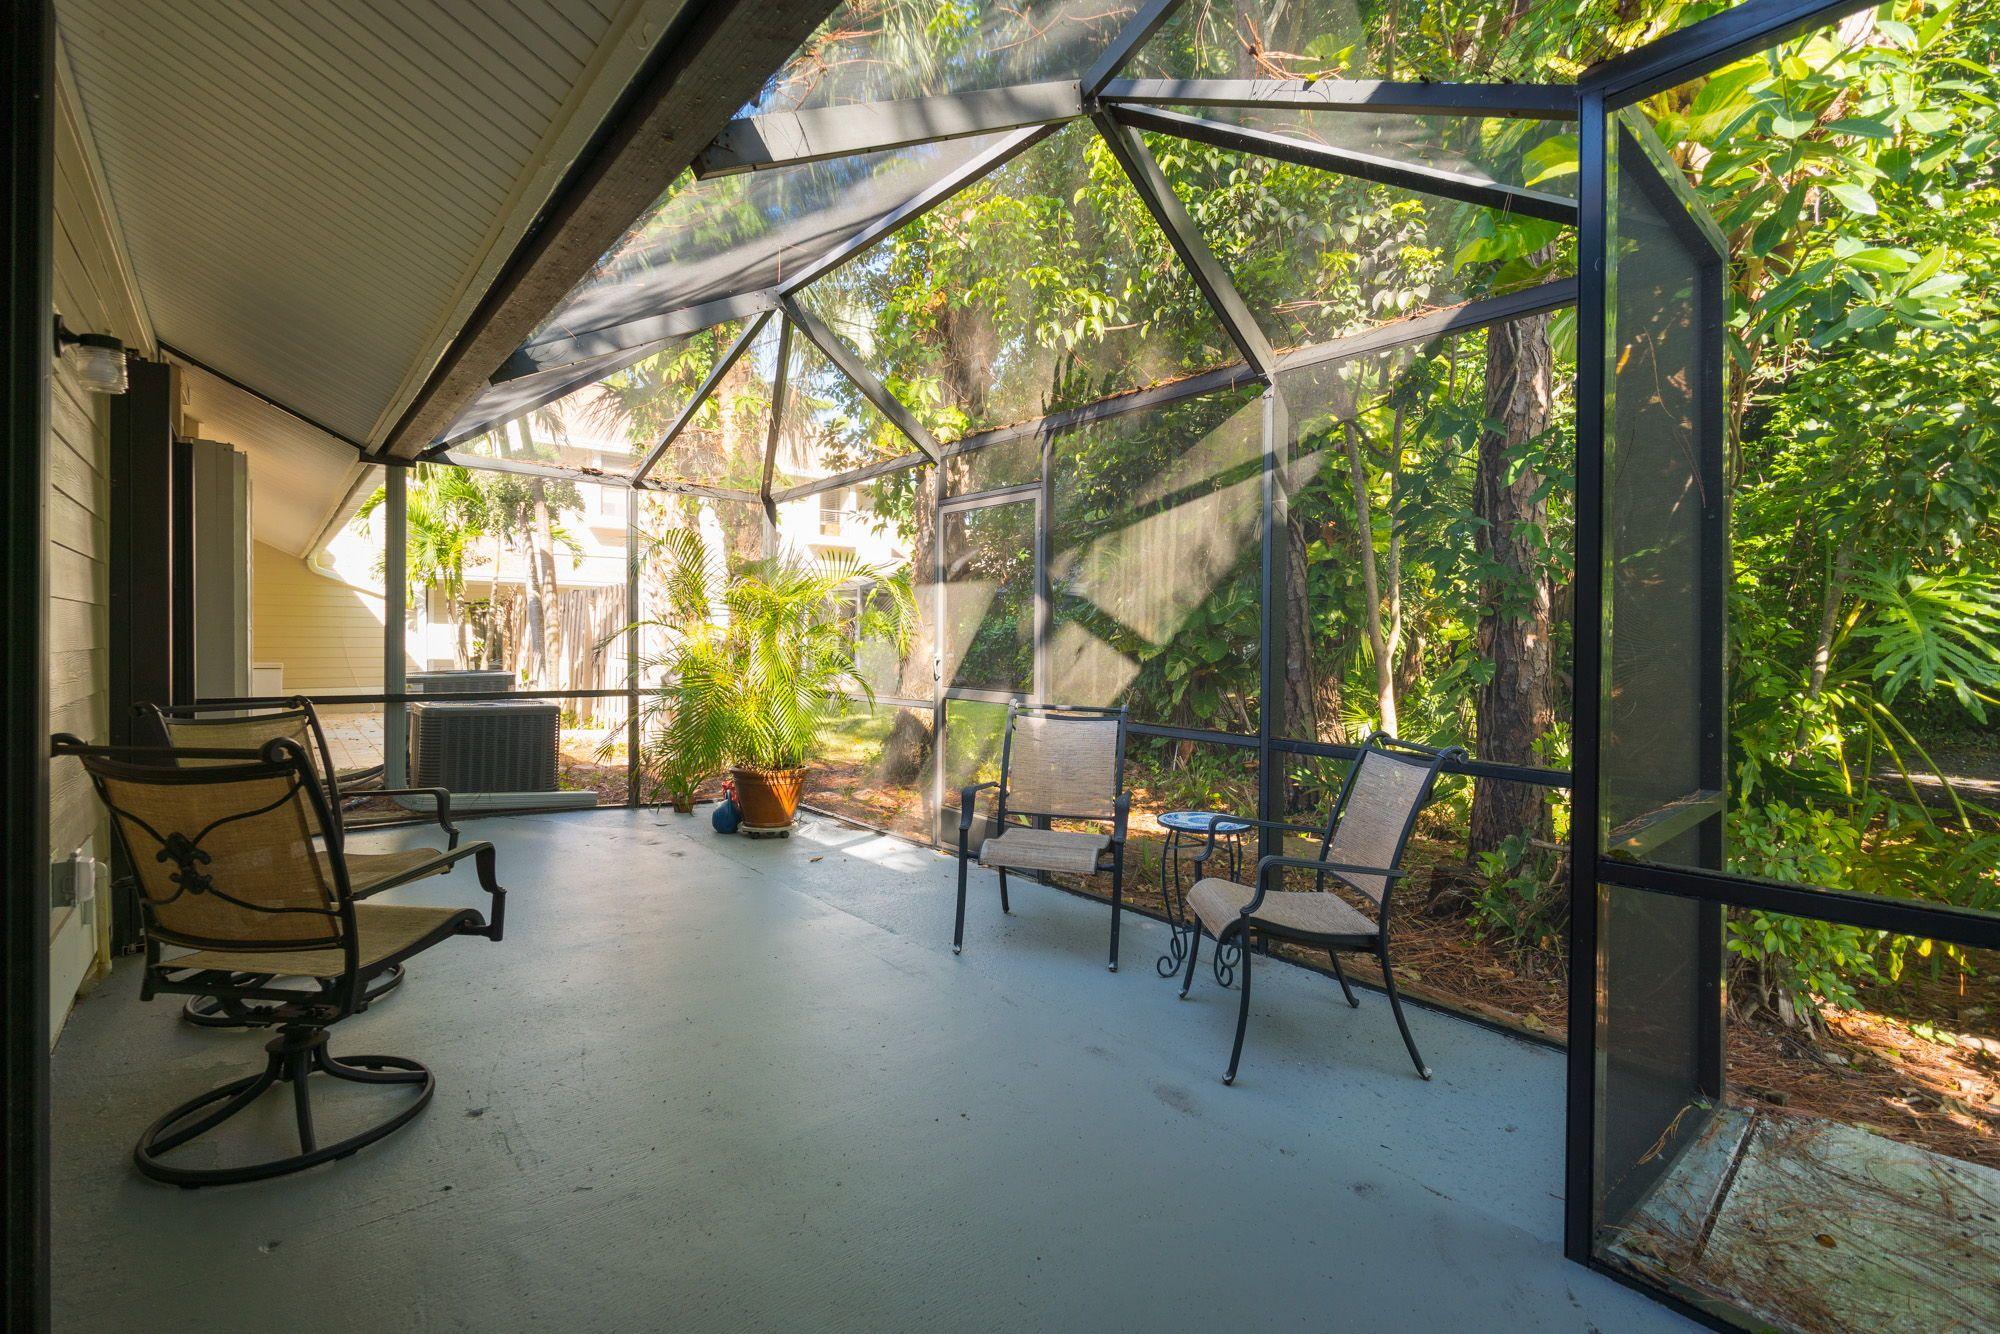 The Patio Has Privacy Trees Floridahomes Interiordesign